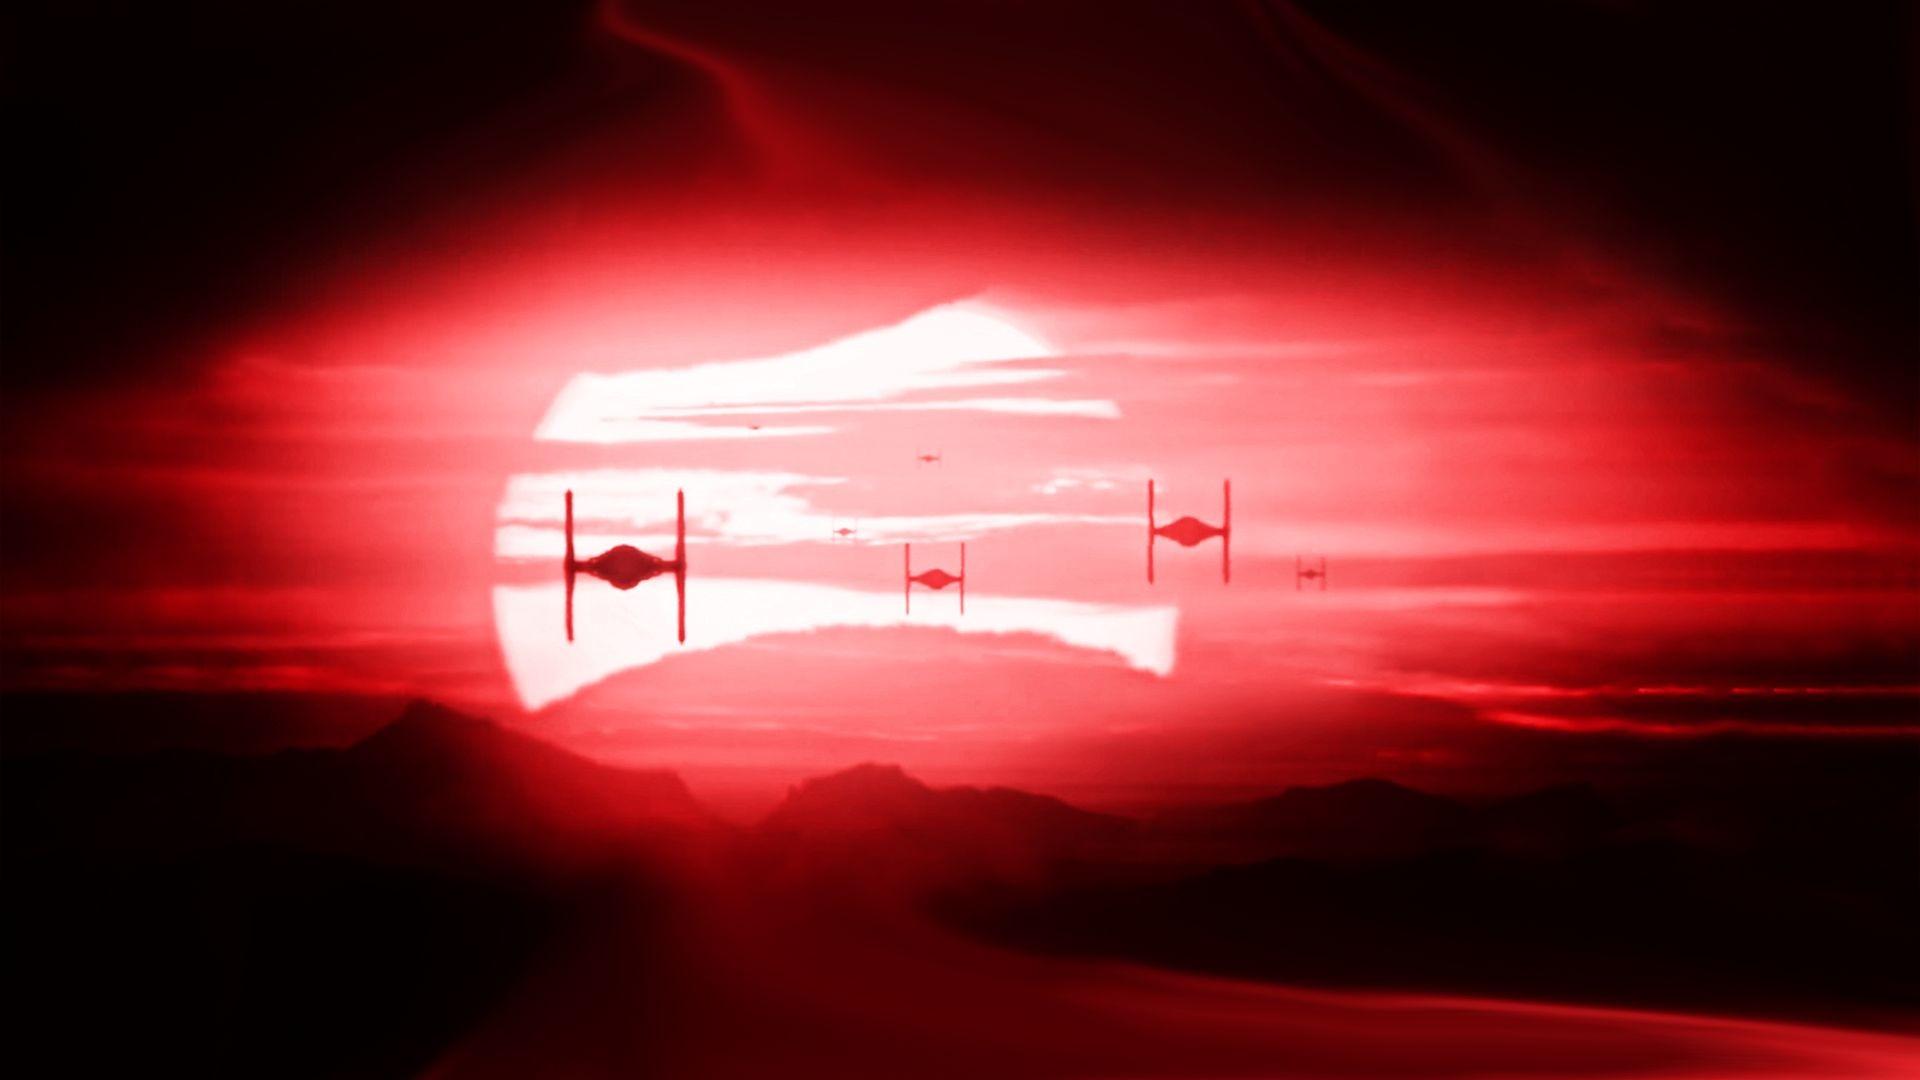 Star wars first order wallpaper 69 images - Star wars the force awakens desktop wallpaper ...